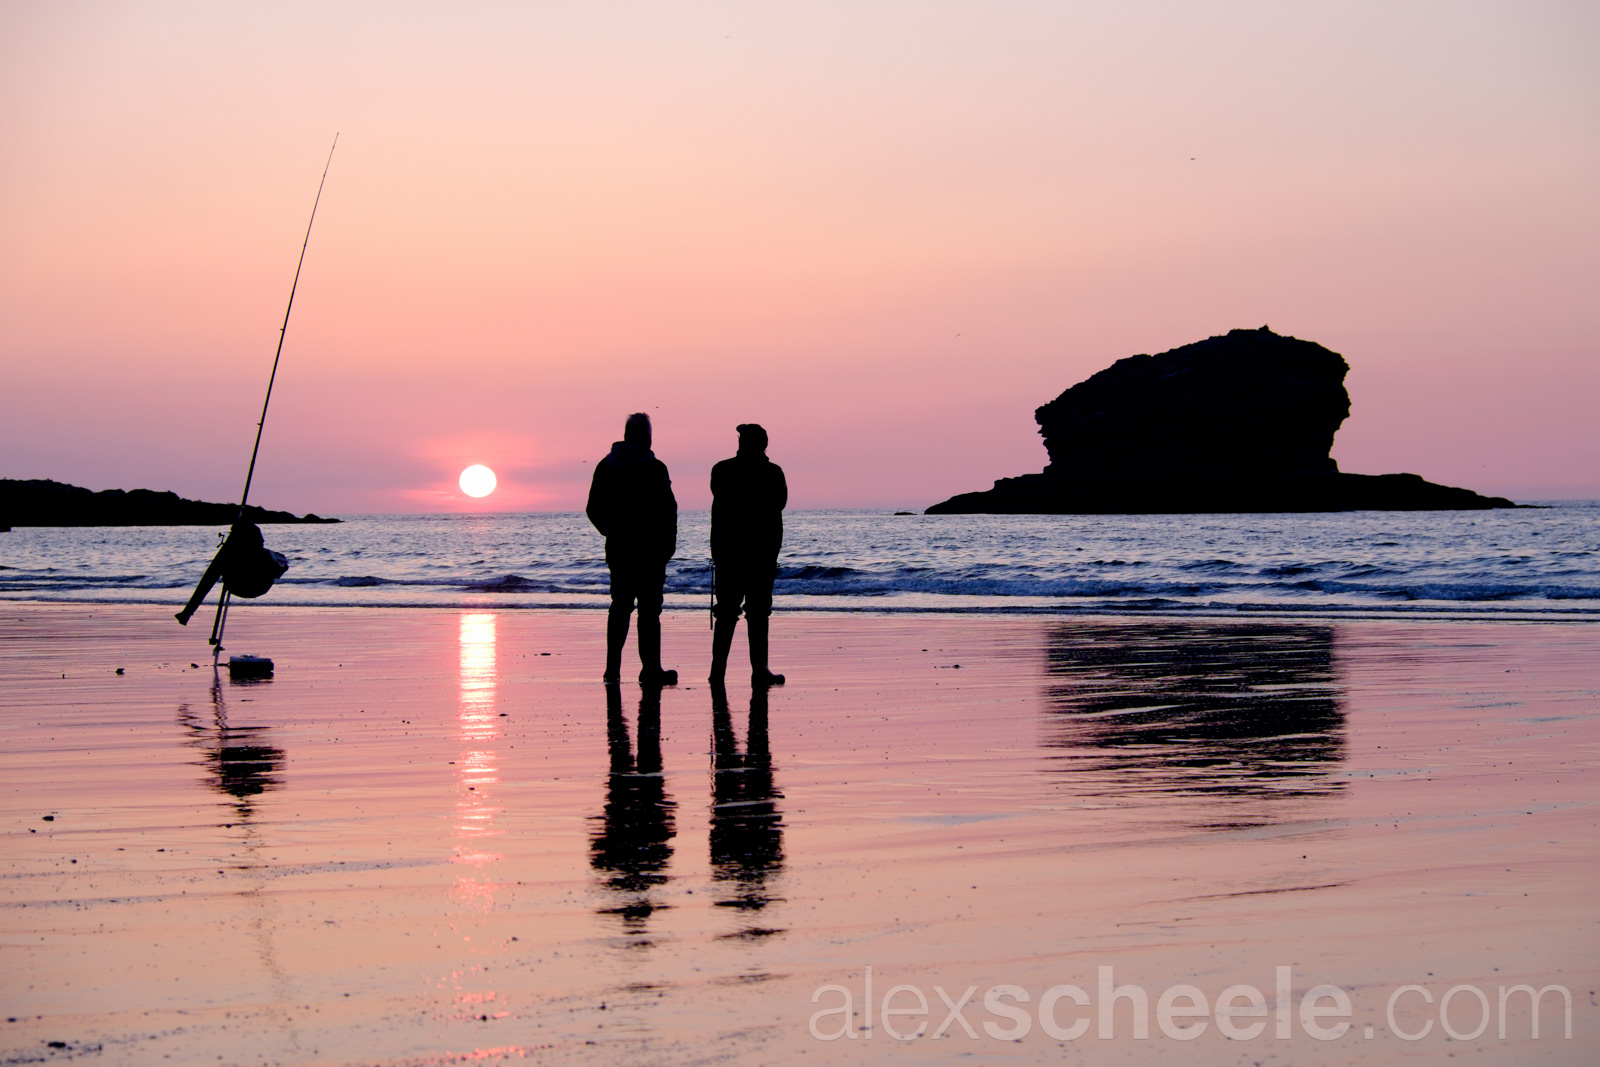 Beach Fishing At Sunset, Portreath